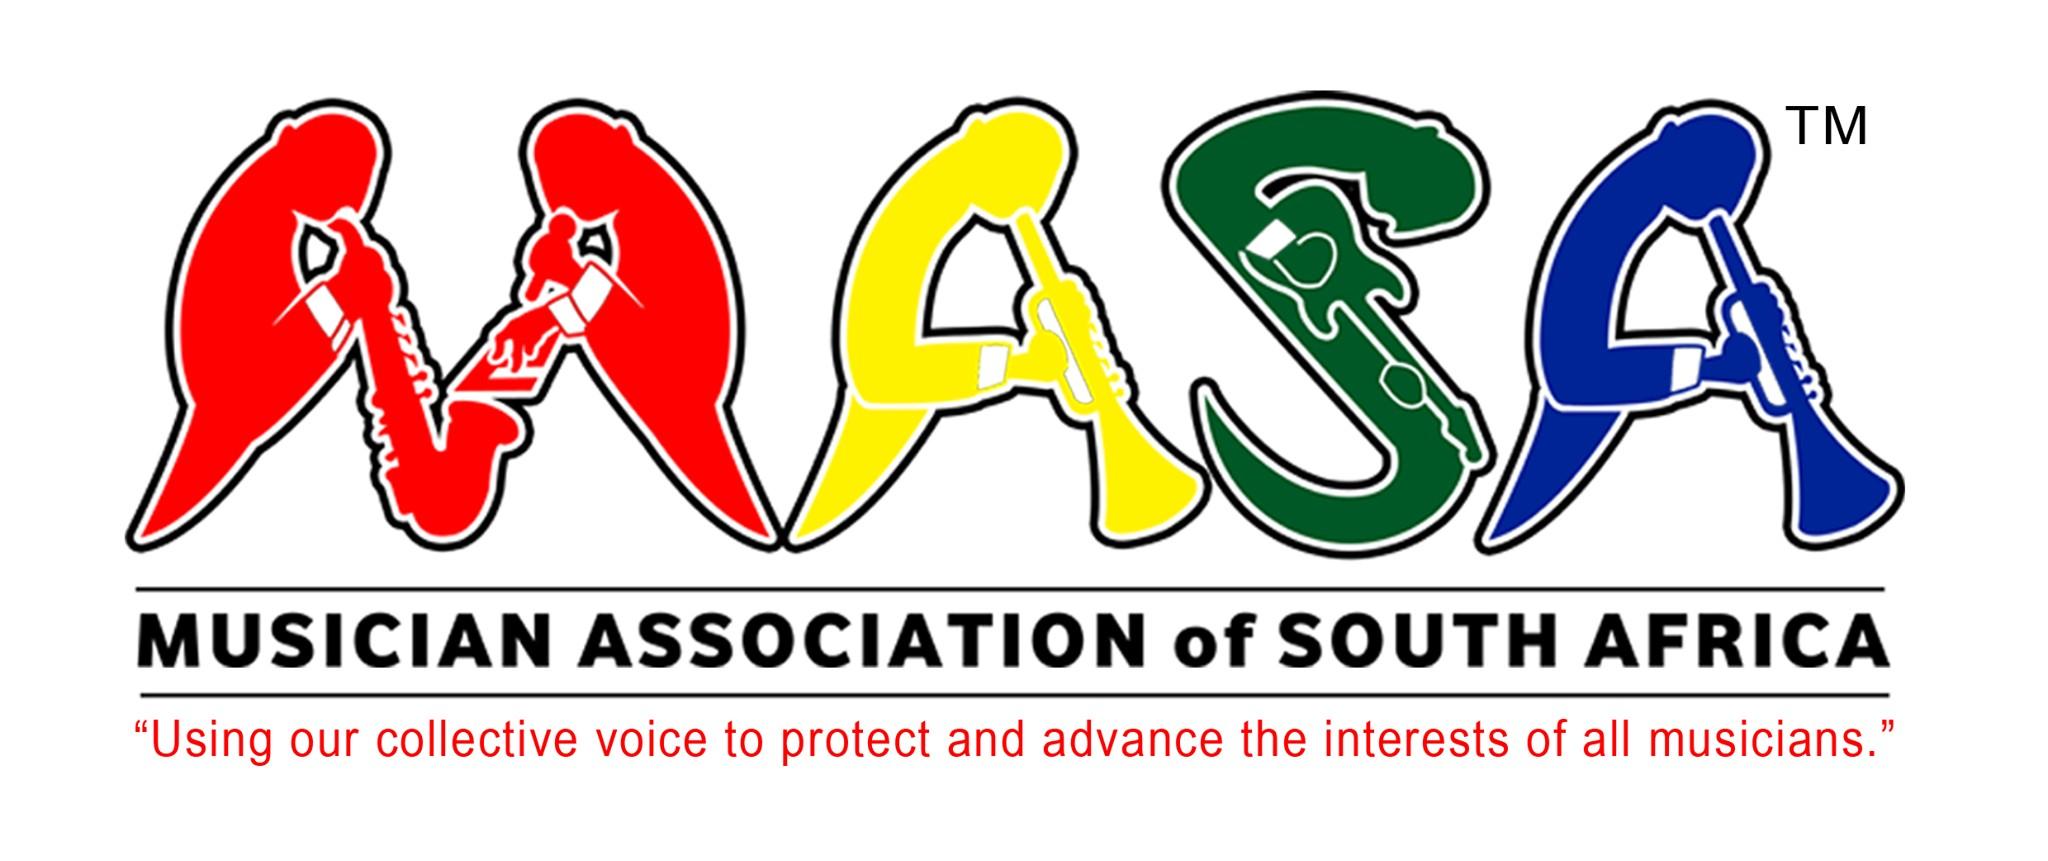 Western Cape Musician Association